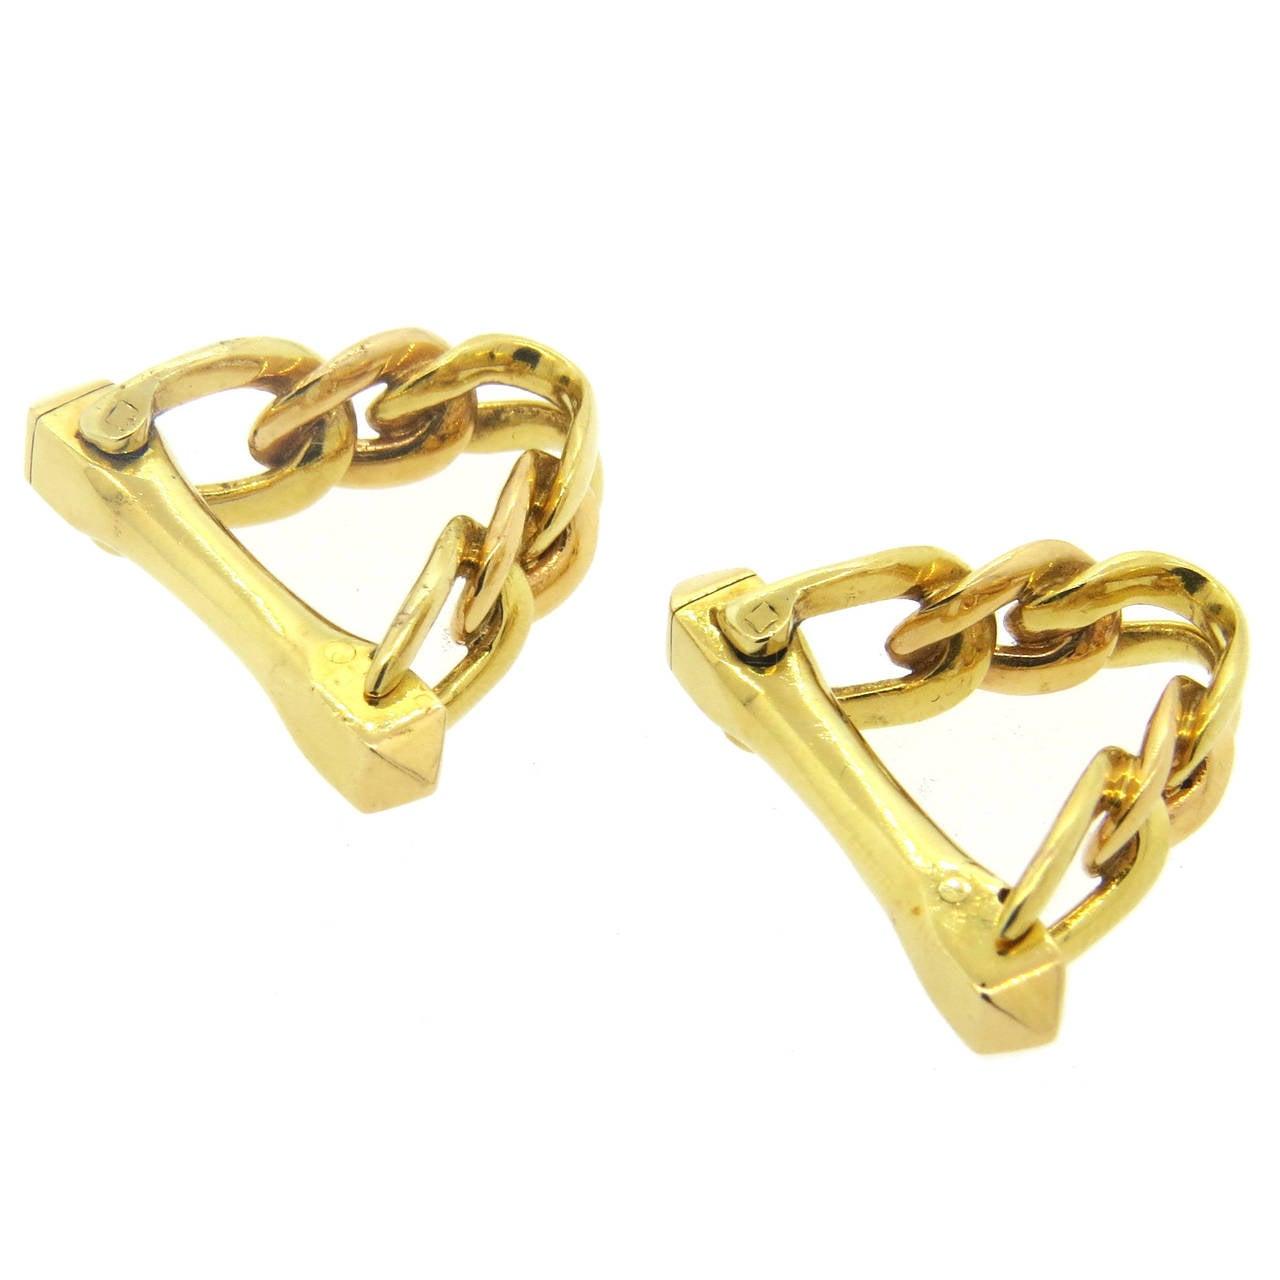 Cartier Paris Gold Stirrup Cufflinks